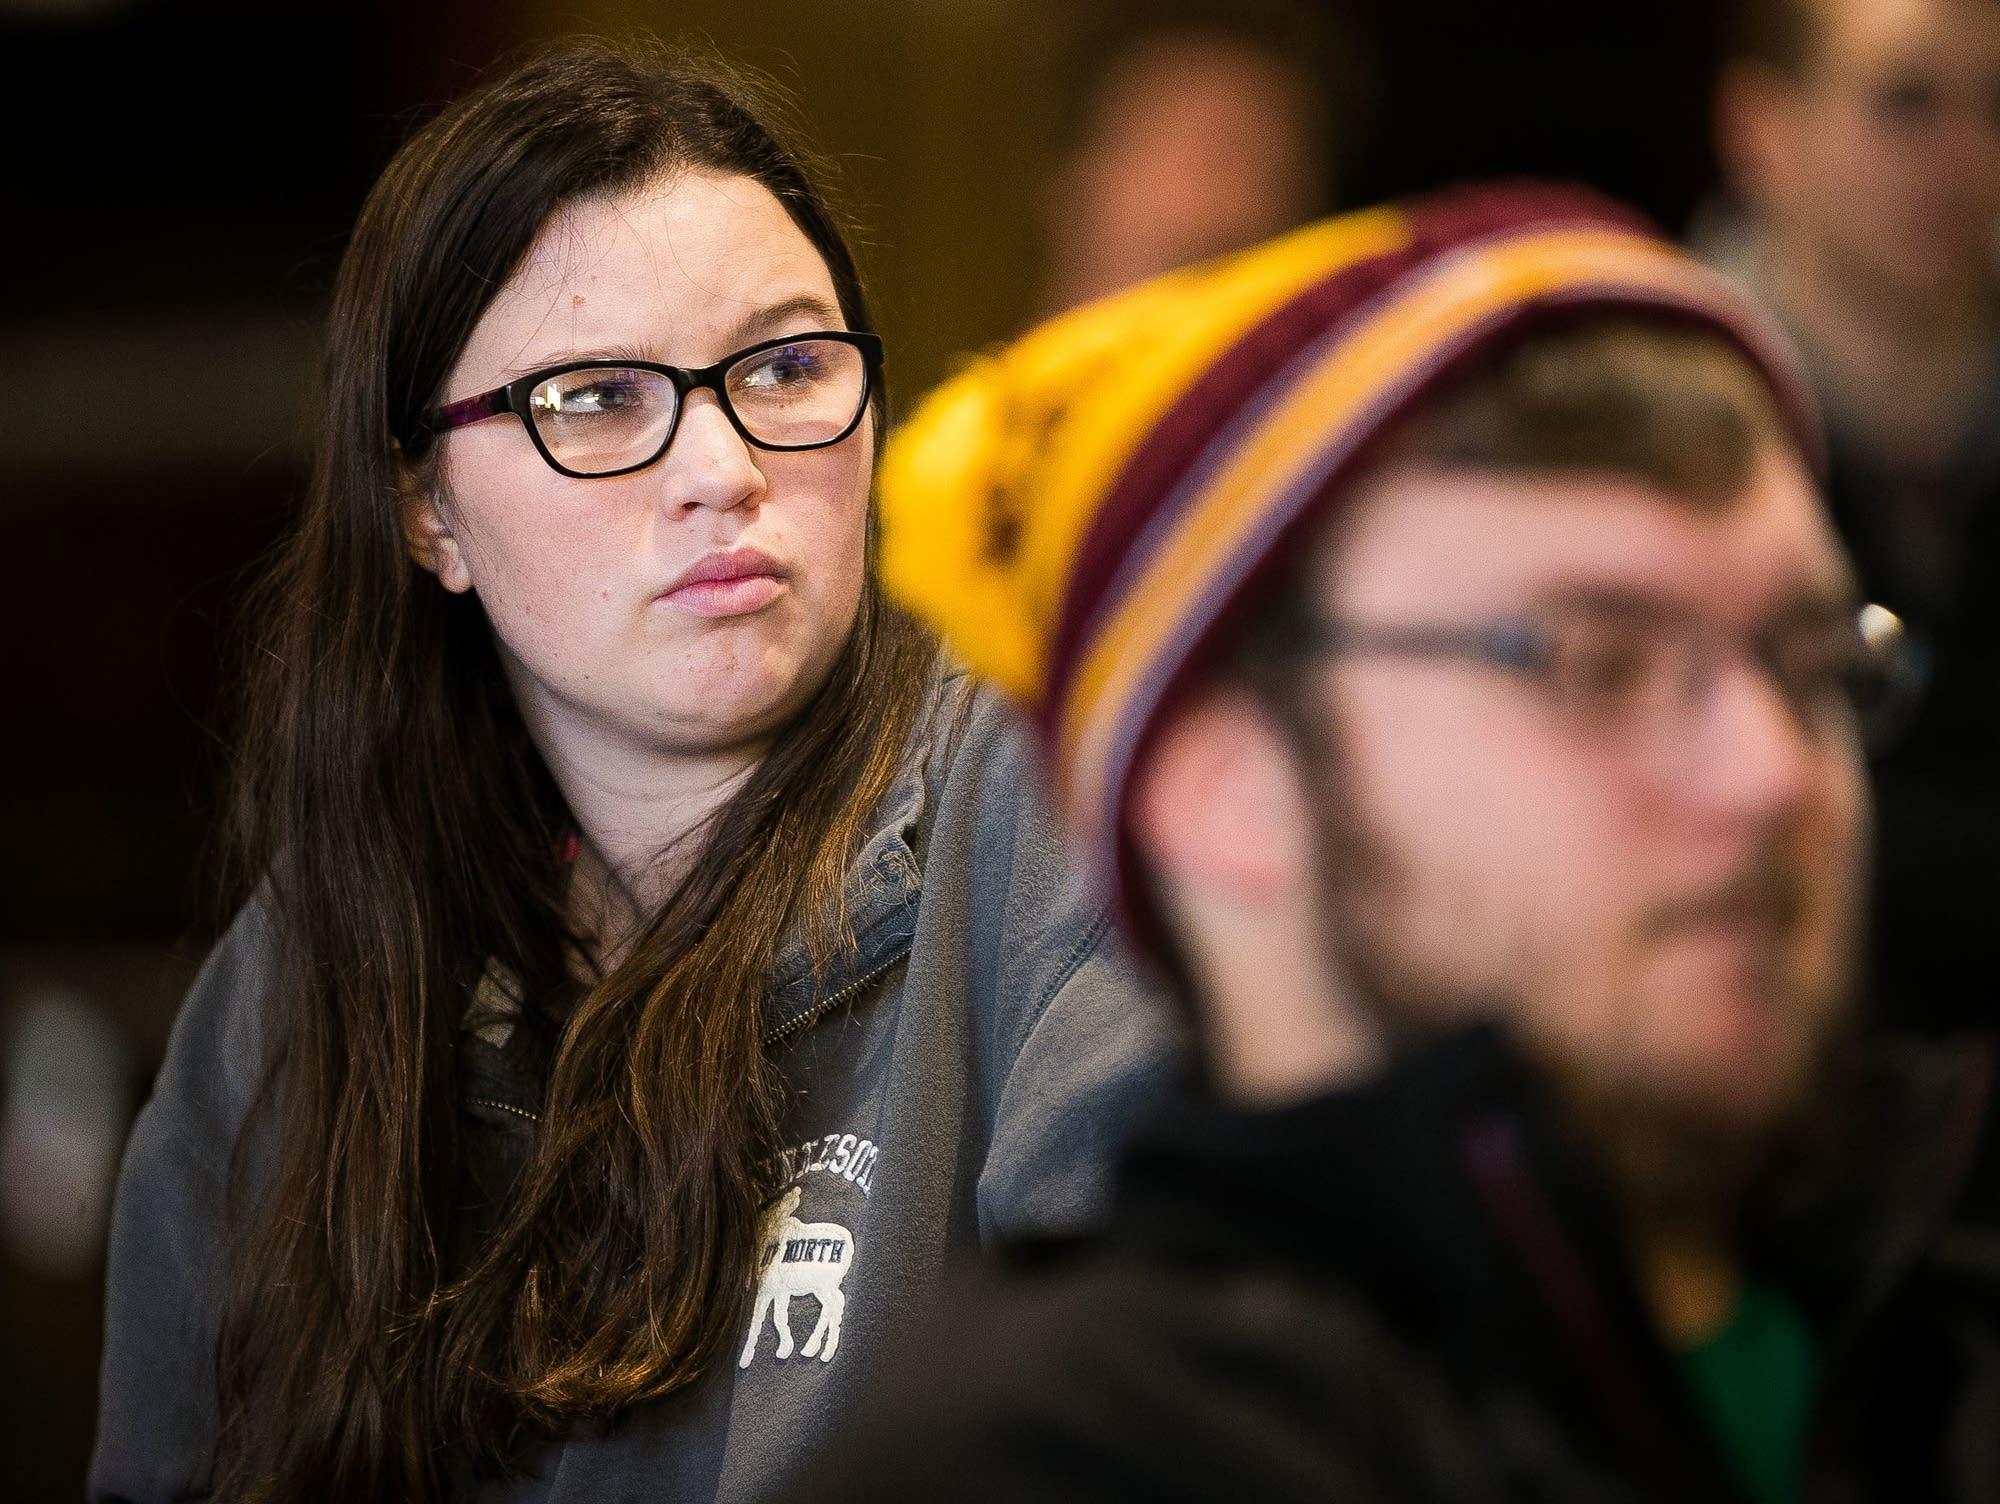 University of Minnesota Duluth students watch Franken resignation speech